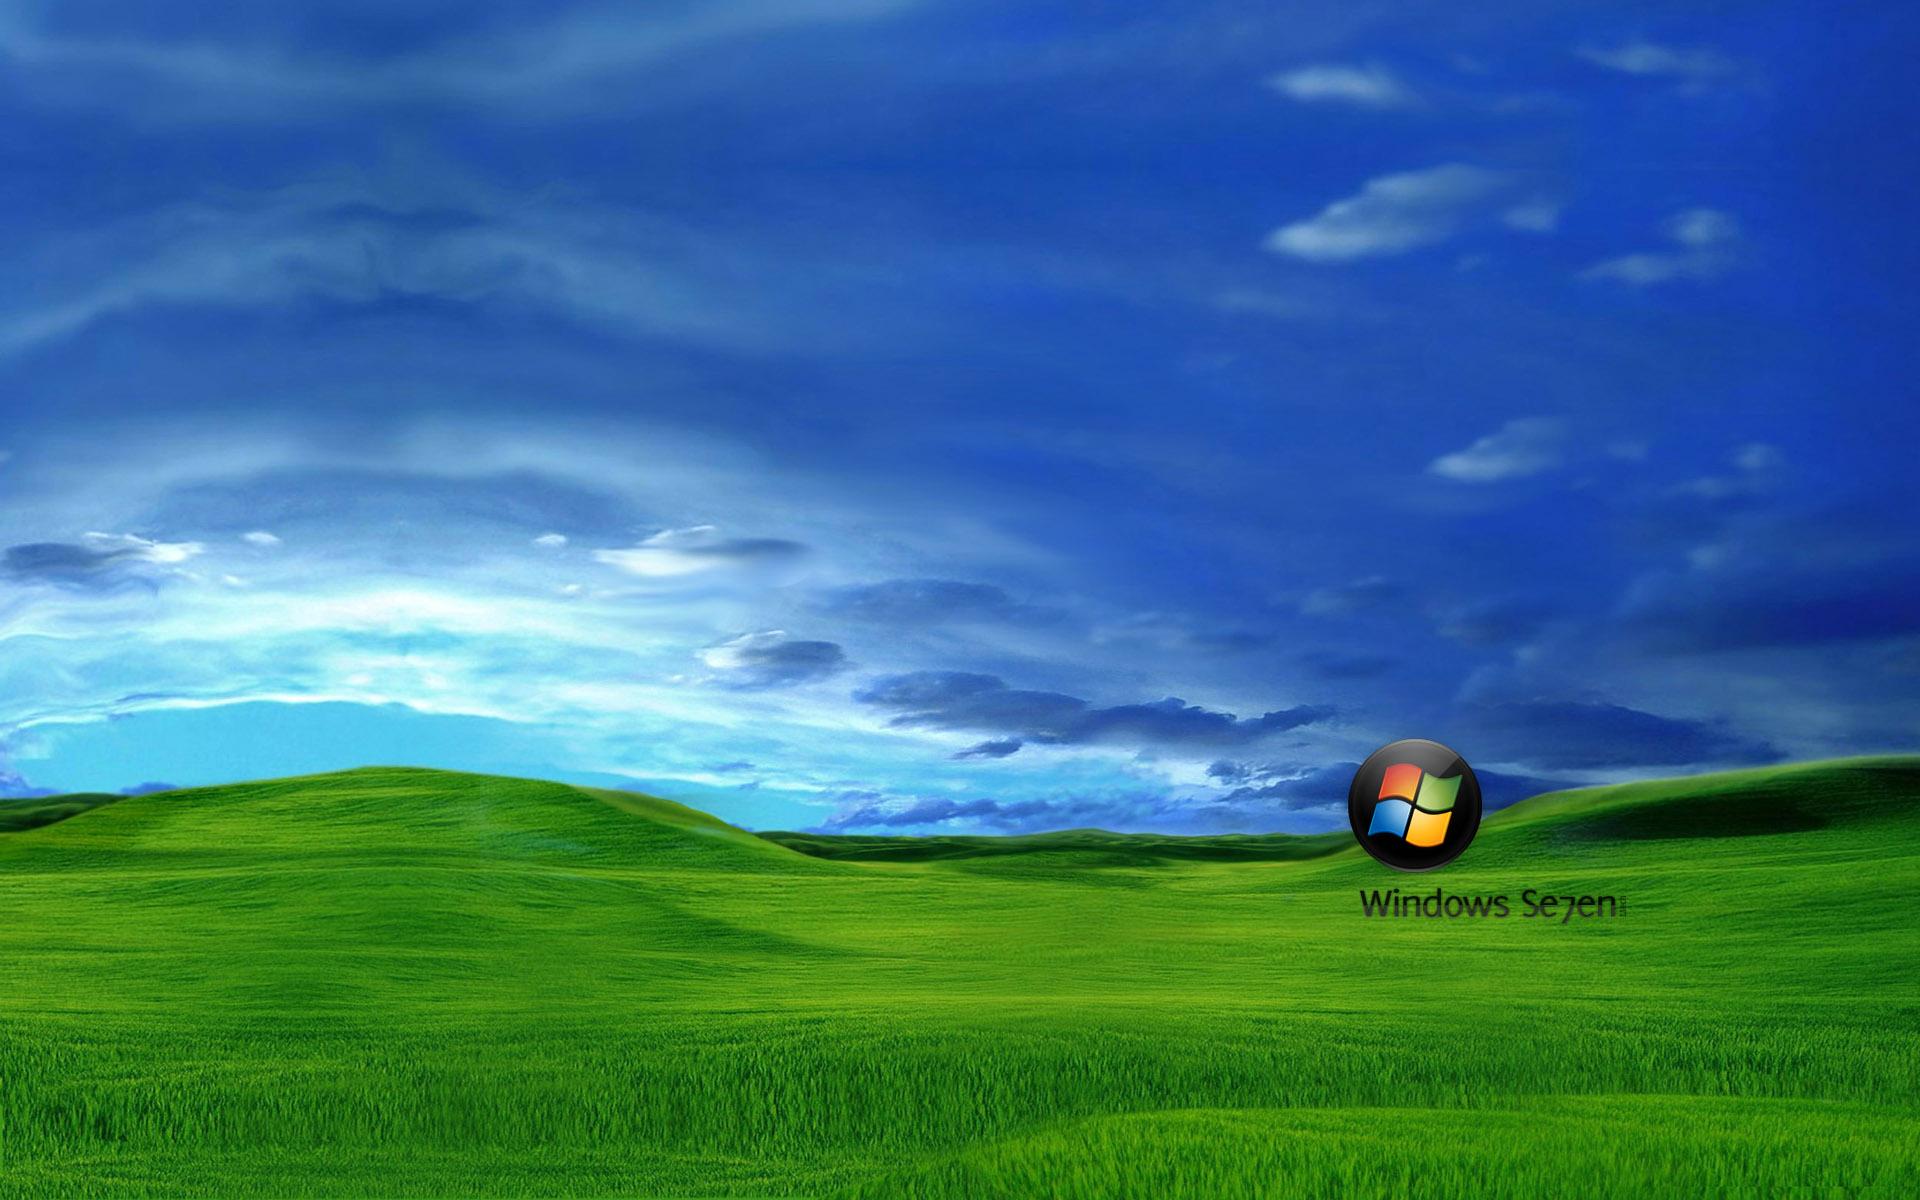 photos desktop wallpaper photo windows backgrounds seven 1920x1200